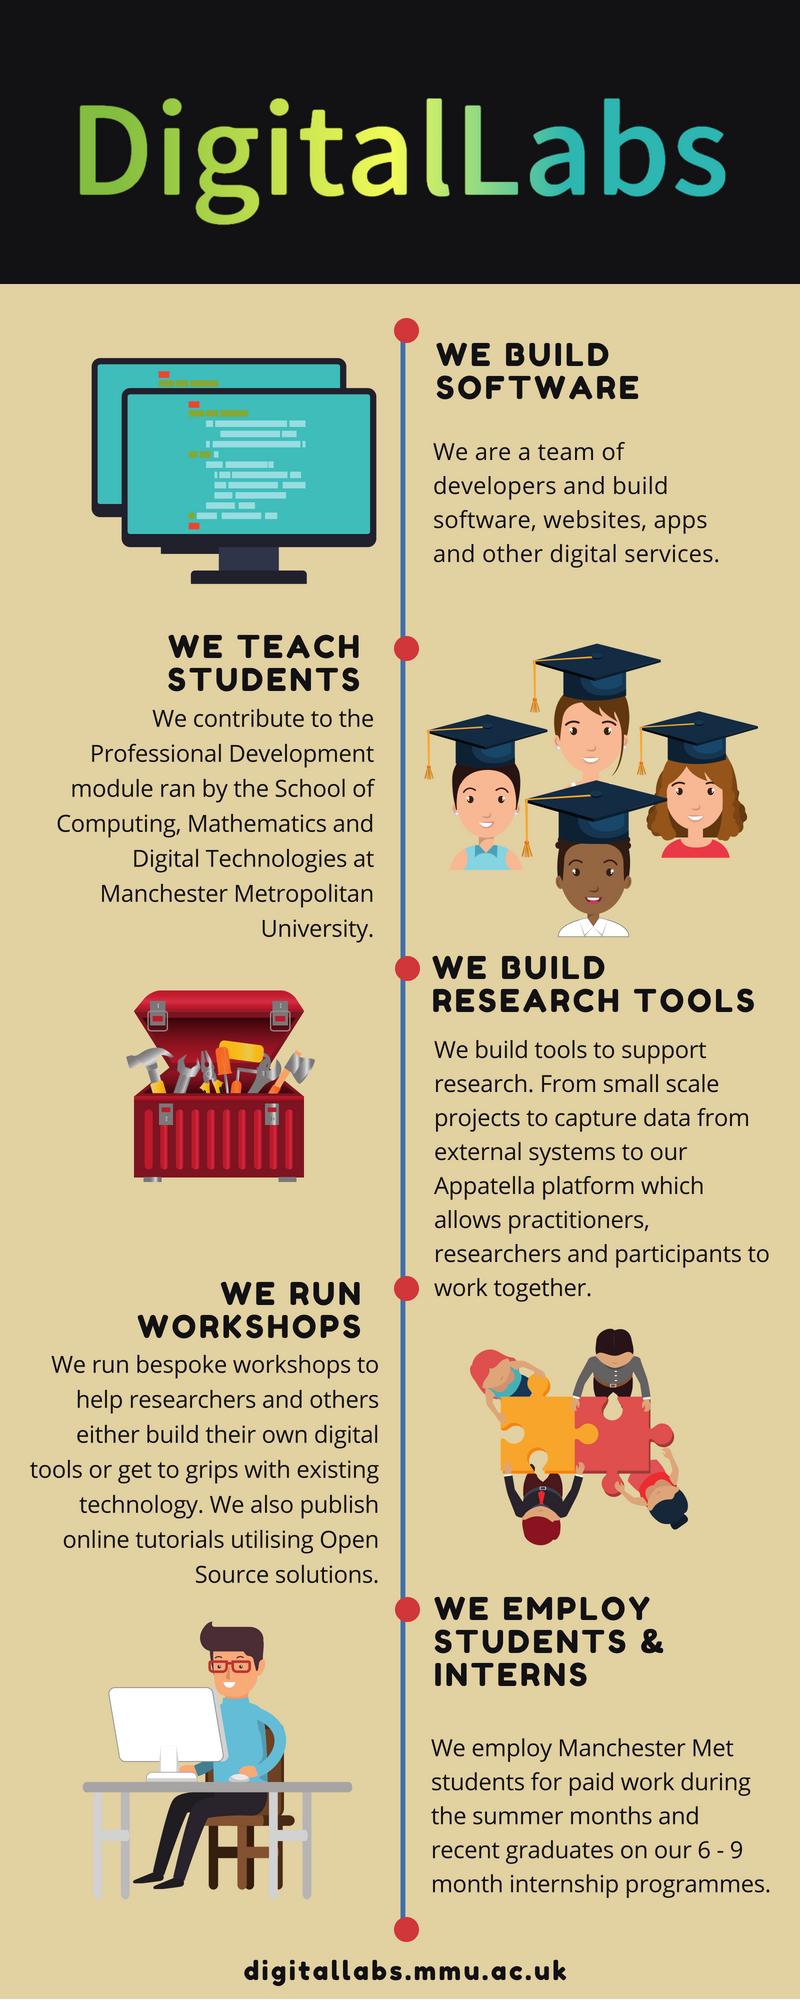 DigitalLabs Infographic